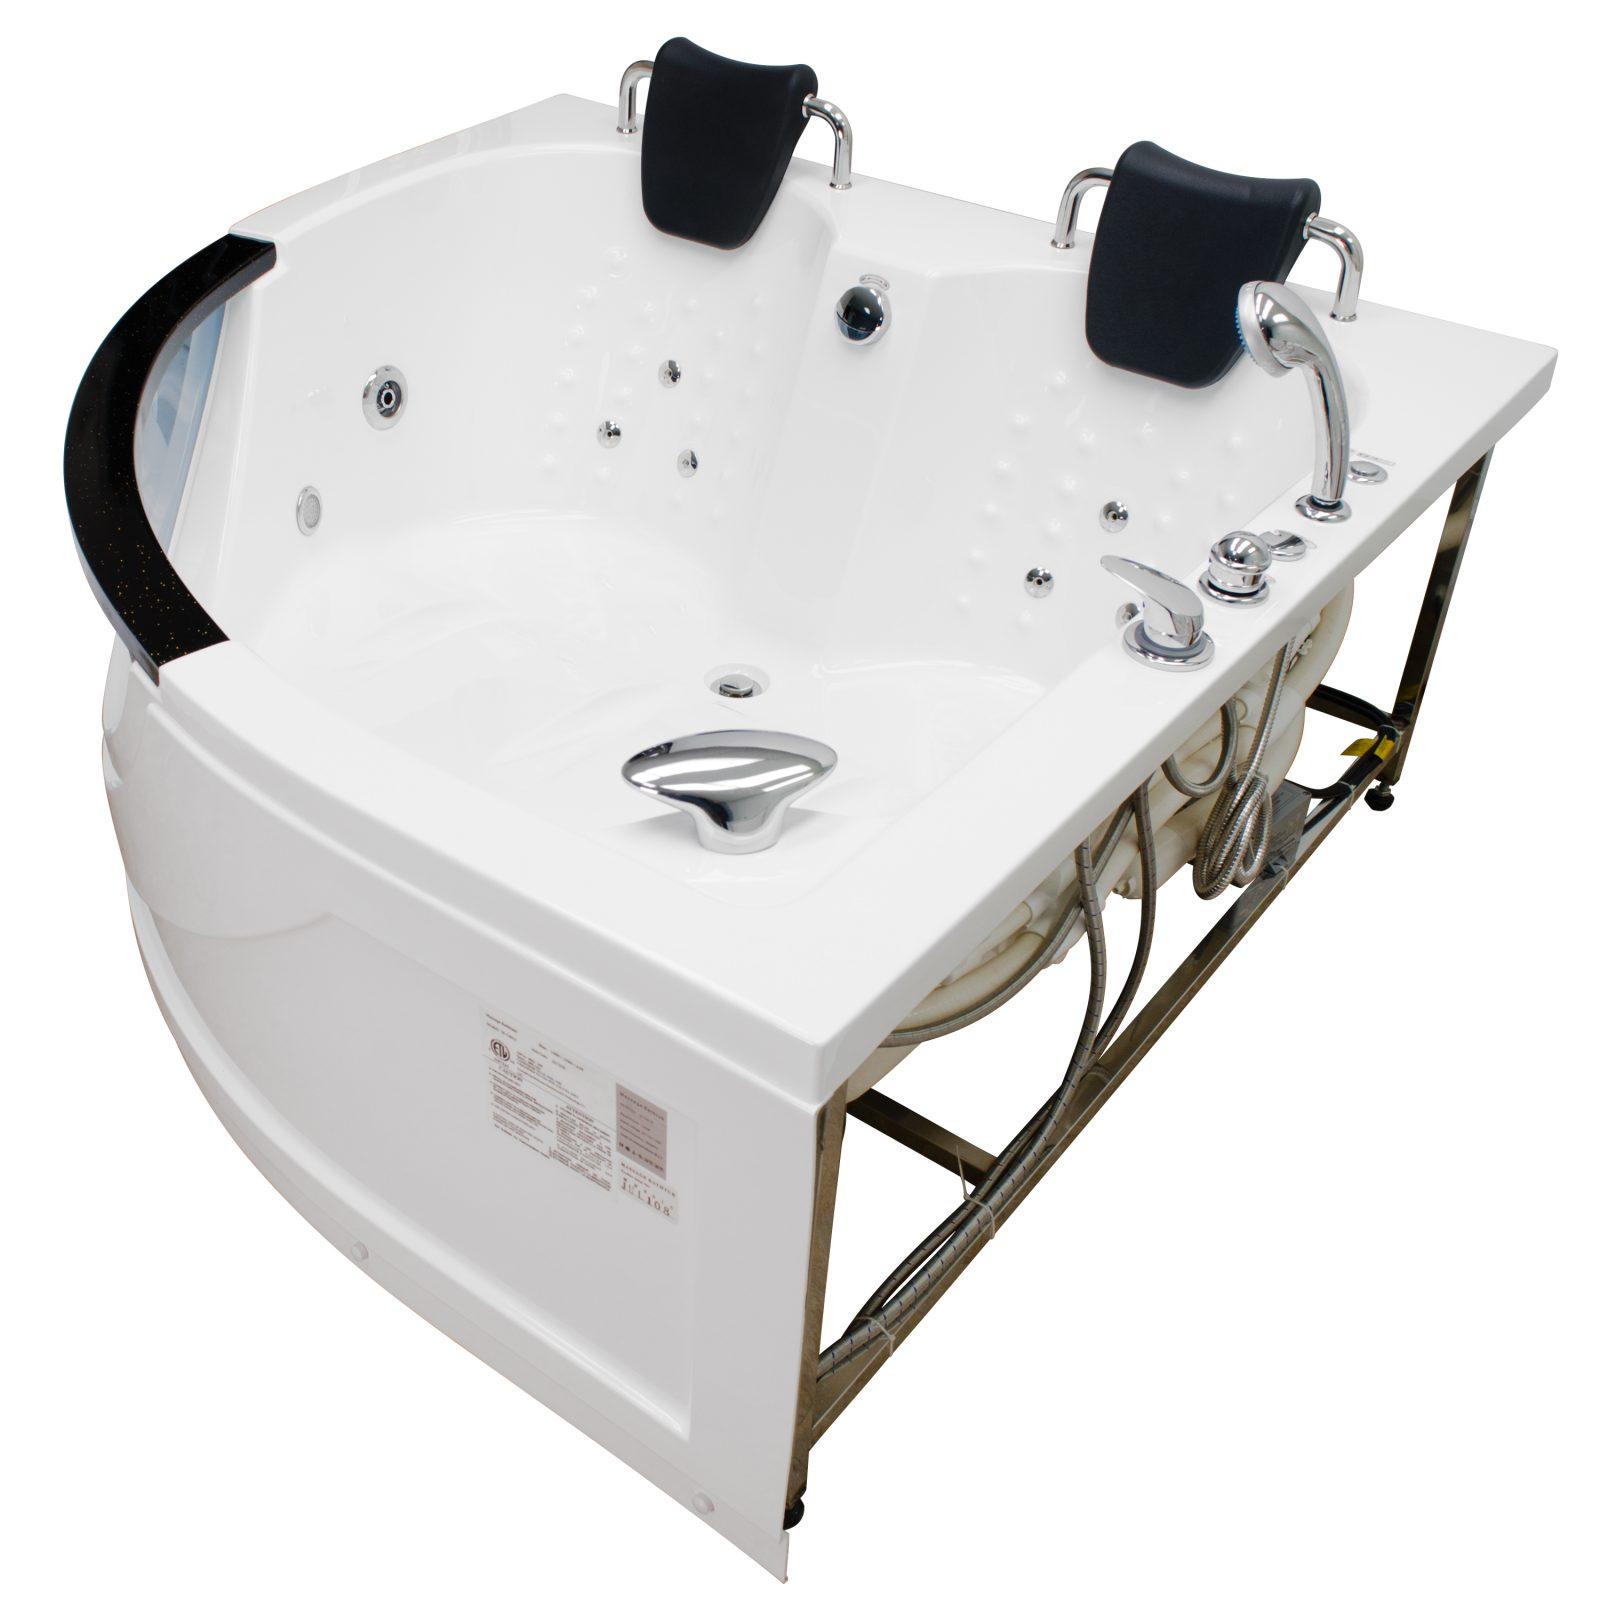 Play Chelsea Spoiling Spa Bath on GirlGcom